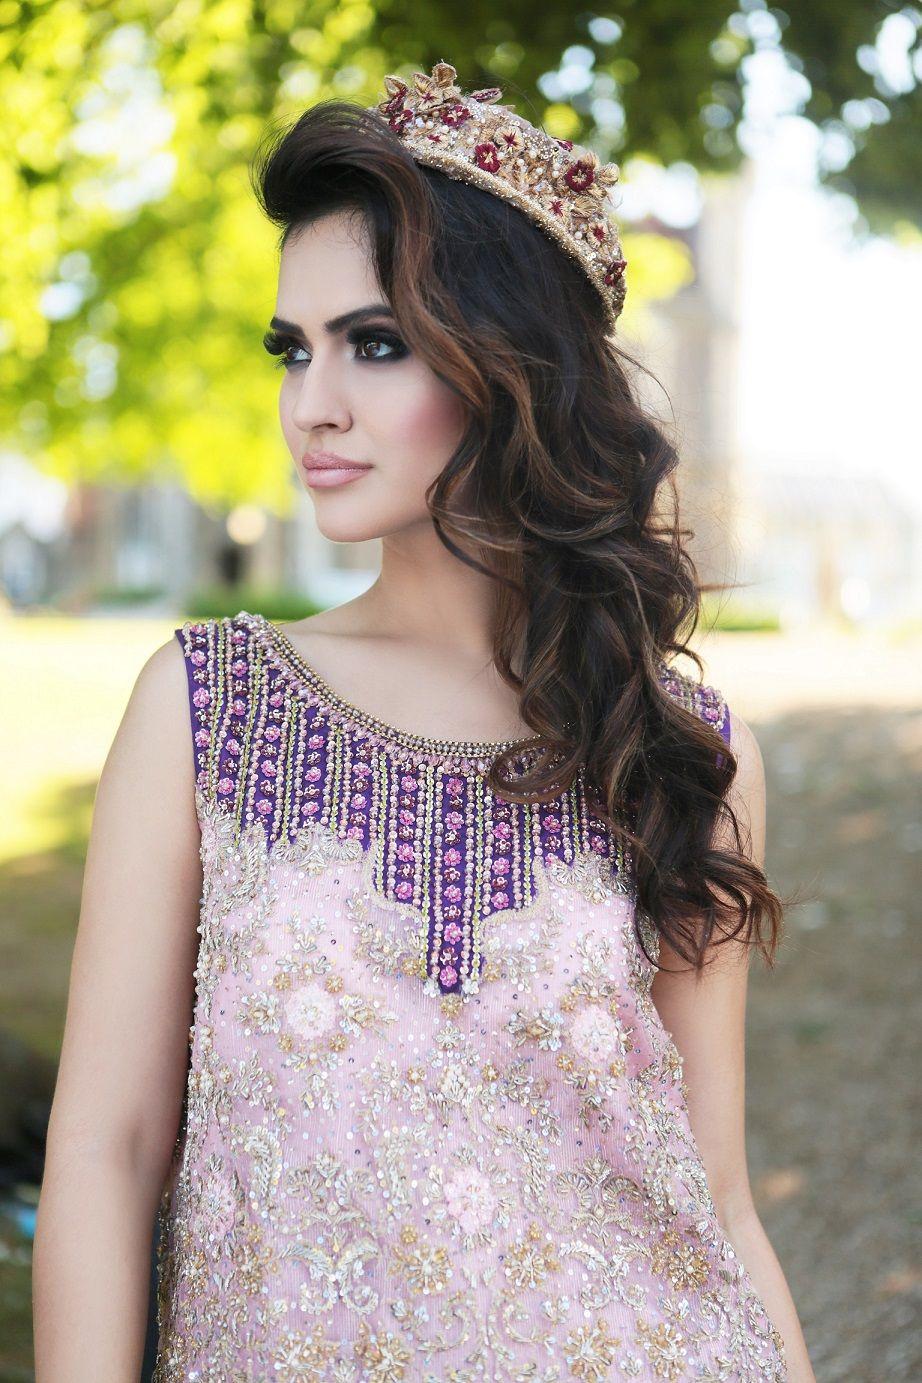 """Designer: Saira Rizwan Photography: Adnan Qazi Hair and Makeup: Sadaf Khan Styling: Farina Ghauri (pakistanstreetstyle) Models: Hammasa, Hajra, Kari """